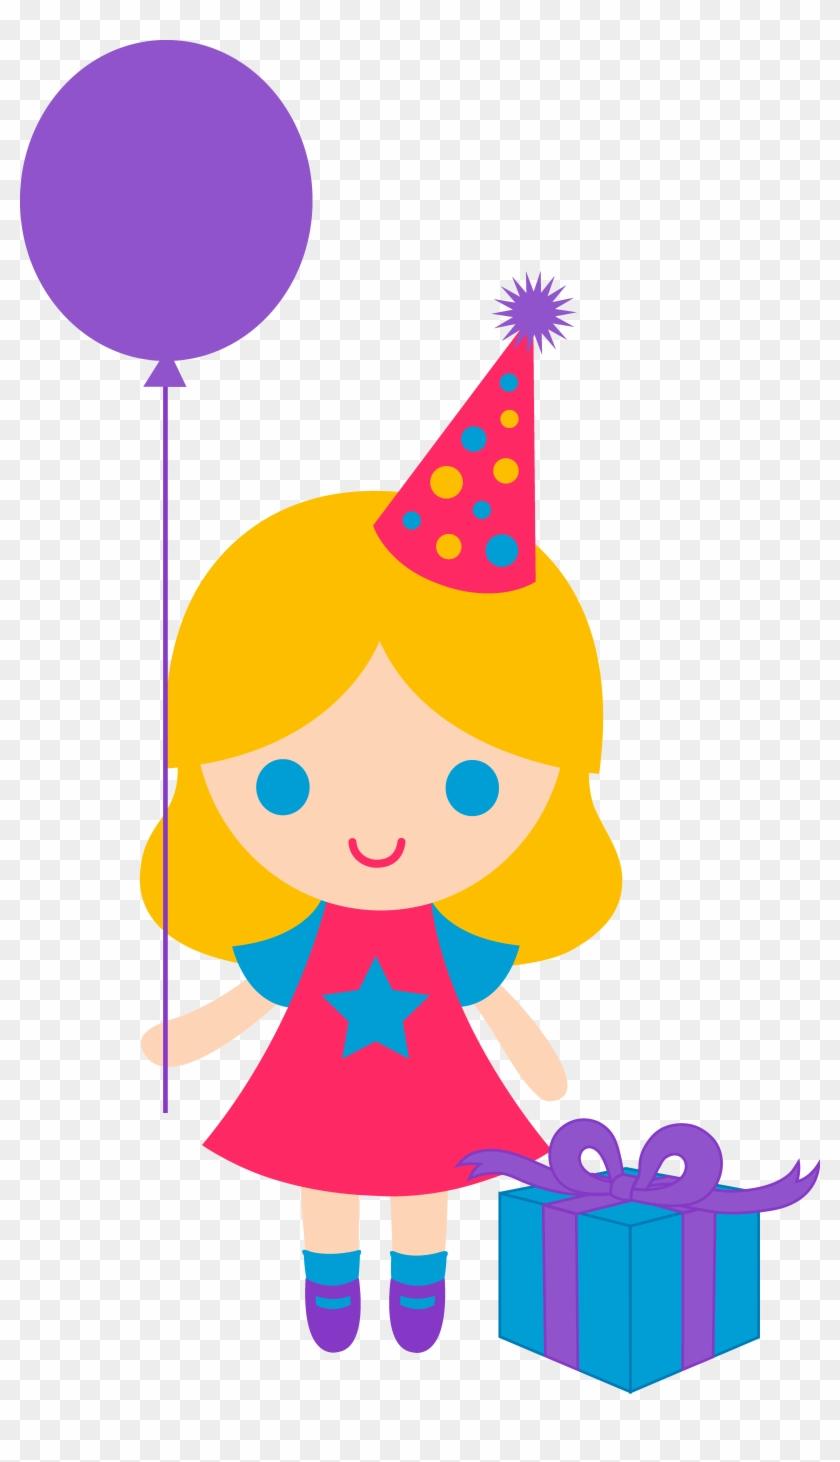 Boy Birthday Cake Clipart - Birthday Girl Clipart #24745